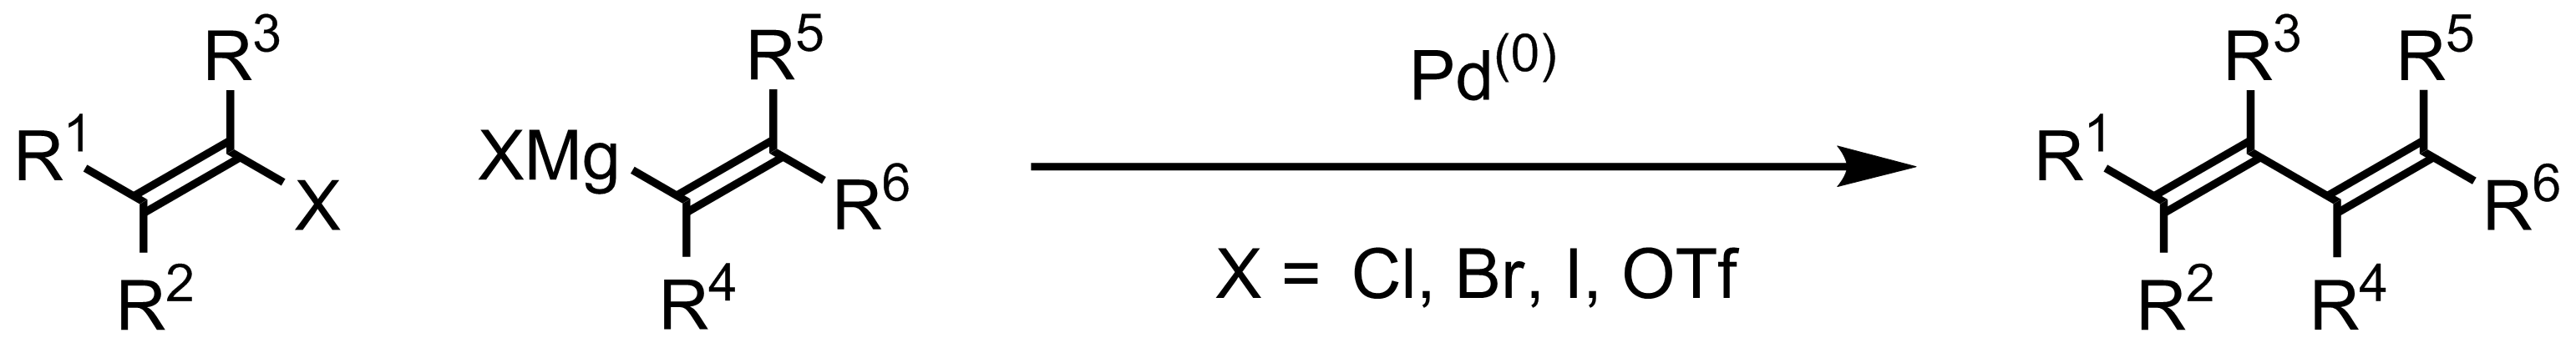 Schematic representation of the Kumada-Corriu Coupling.